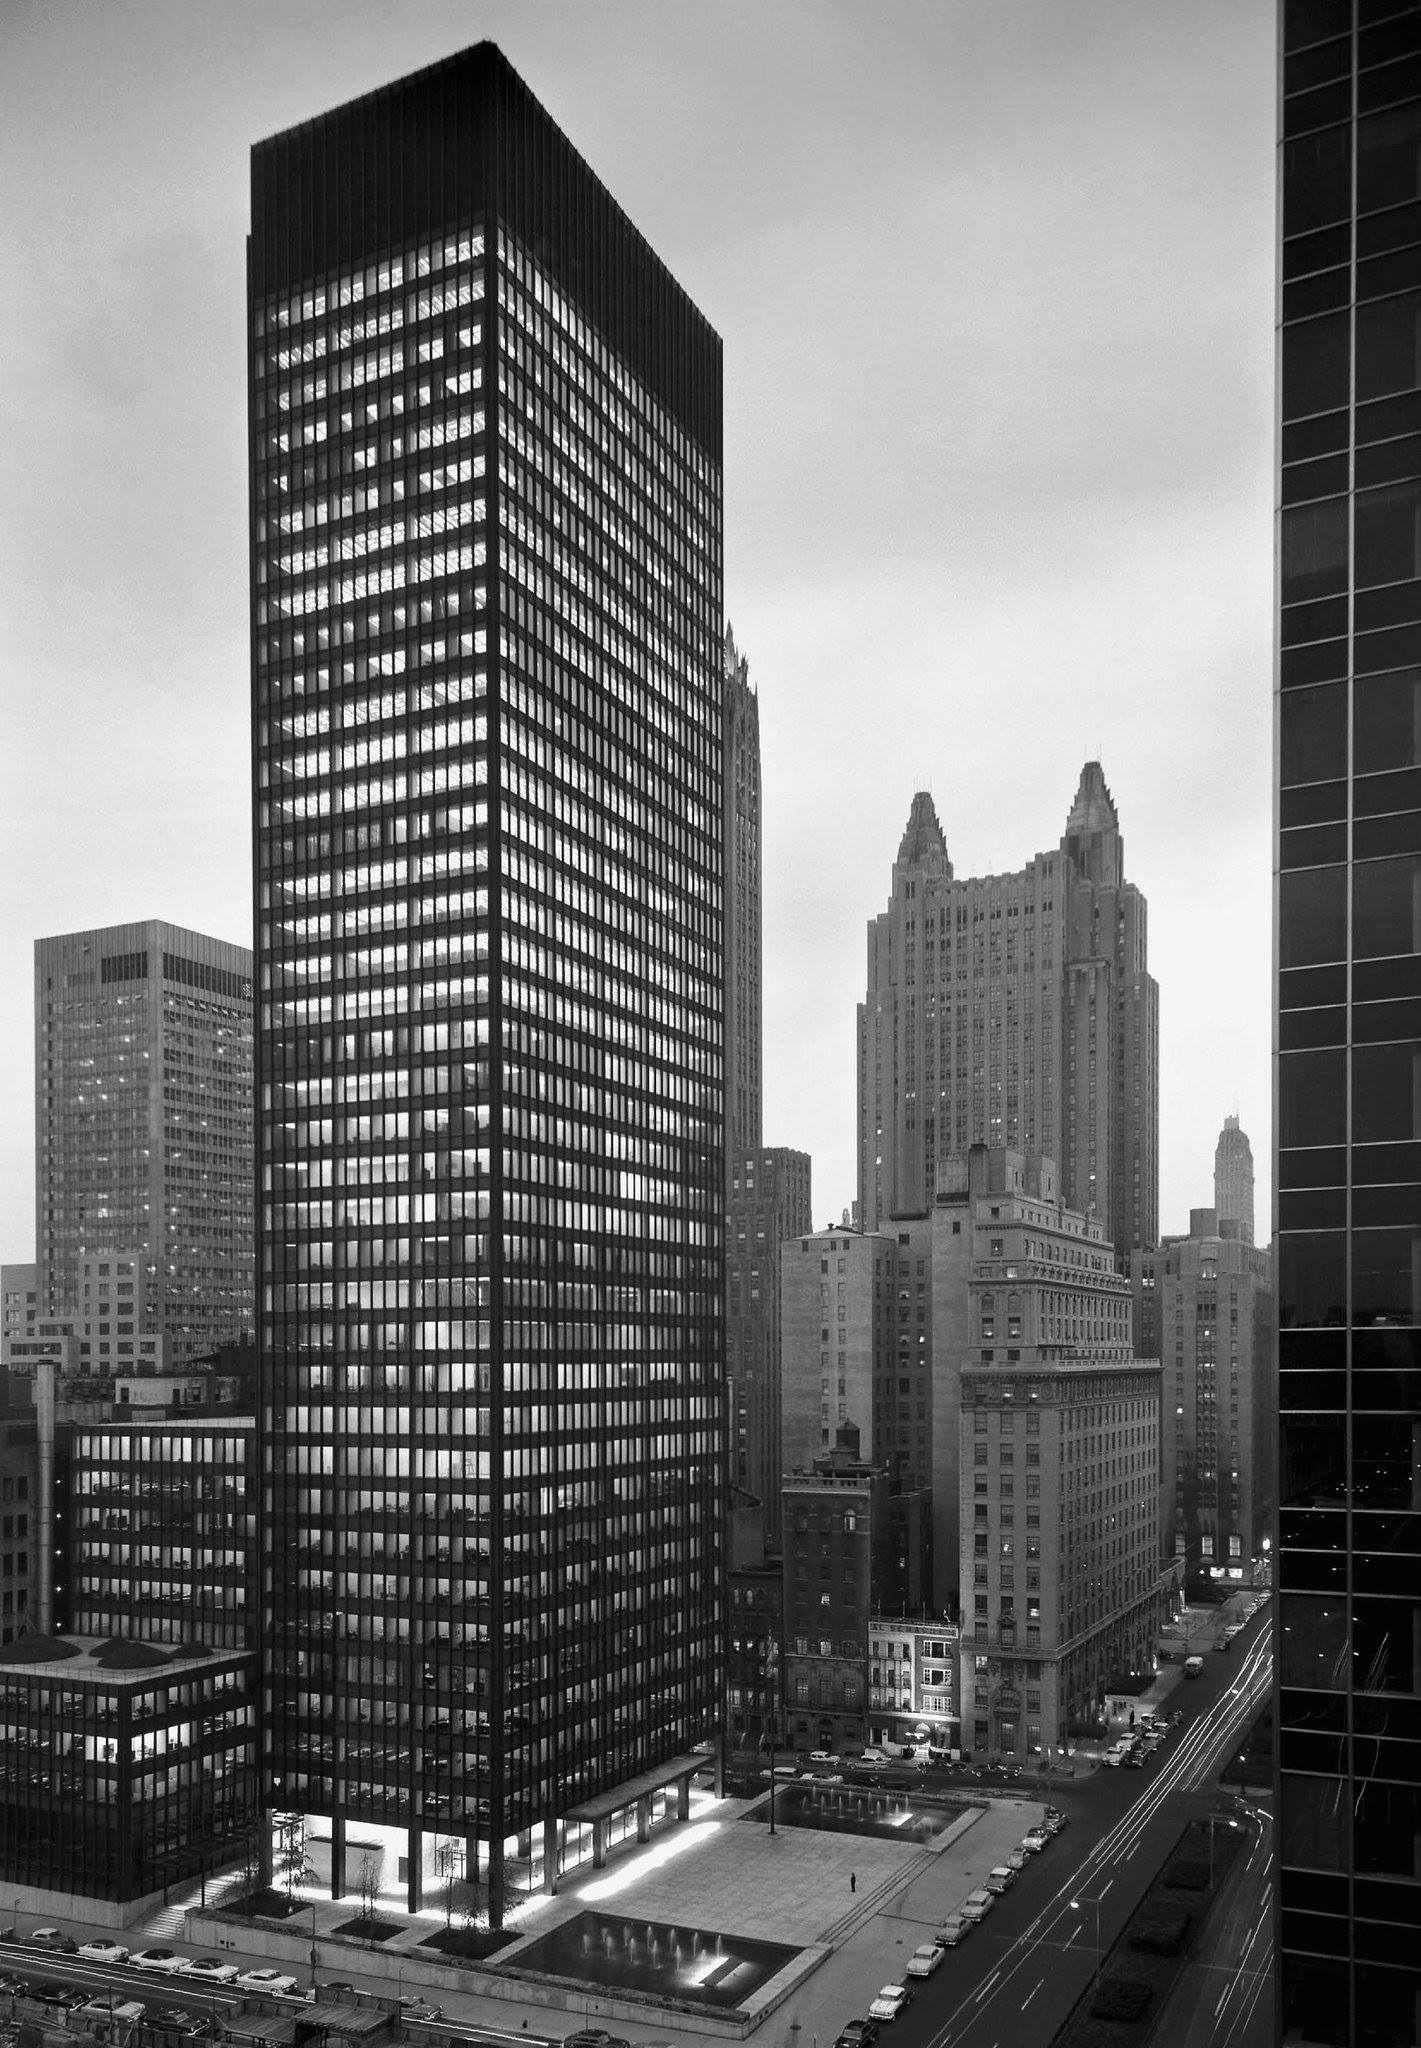 Seagram's Building, New York, Ludwig Mies van der Rohe